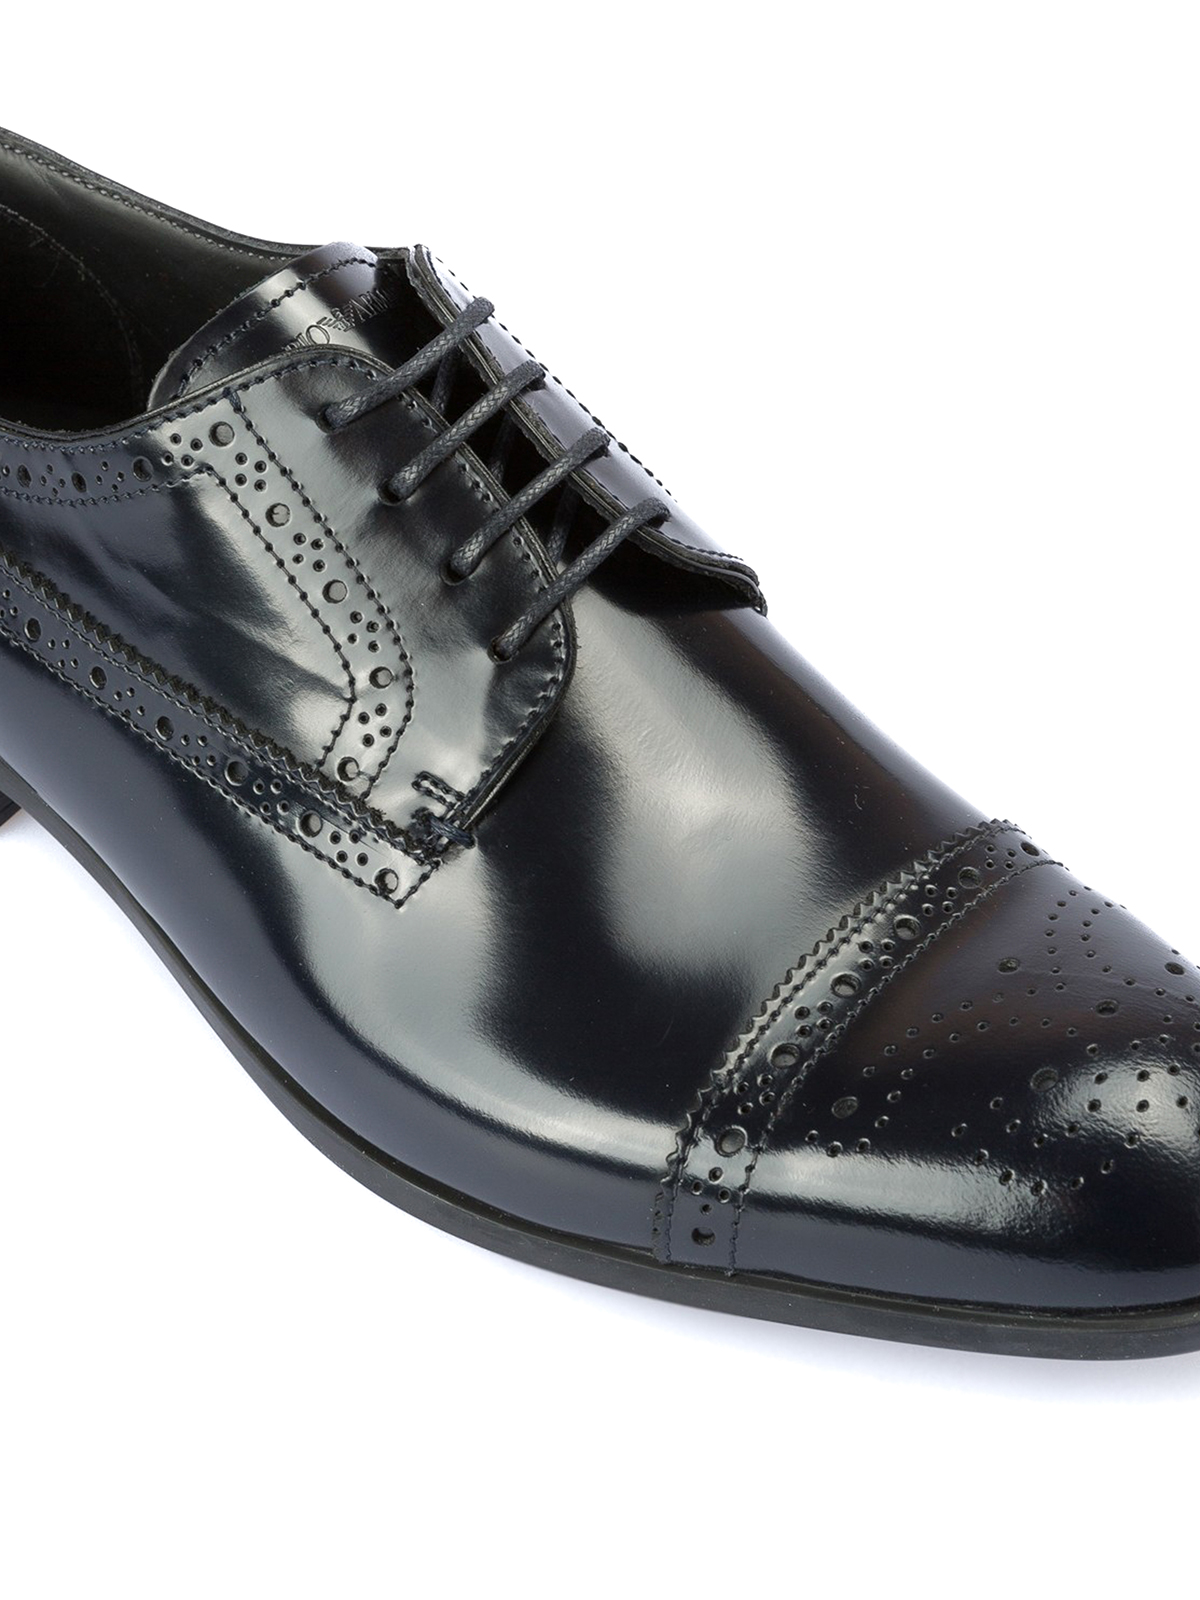 9f14d7b68ef iKRIX EMPORIO ARMANI  Chaussures classiques - Chaussures - Bleu